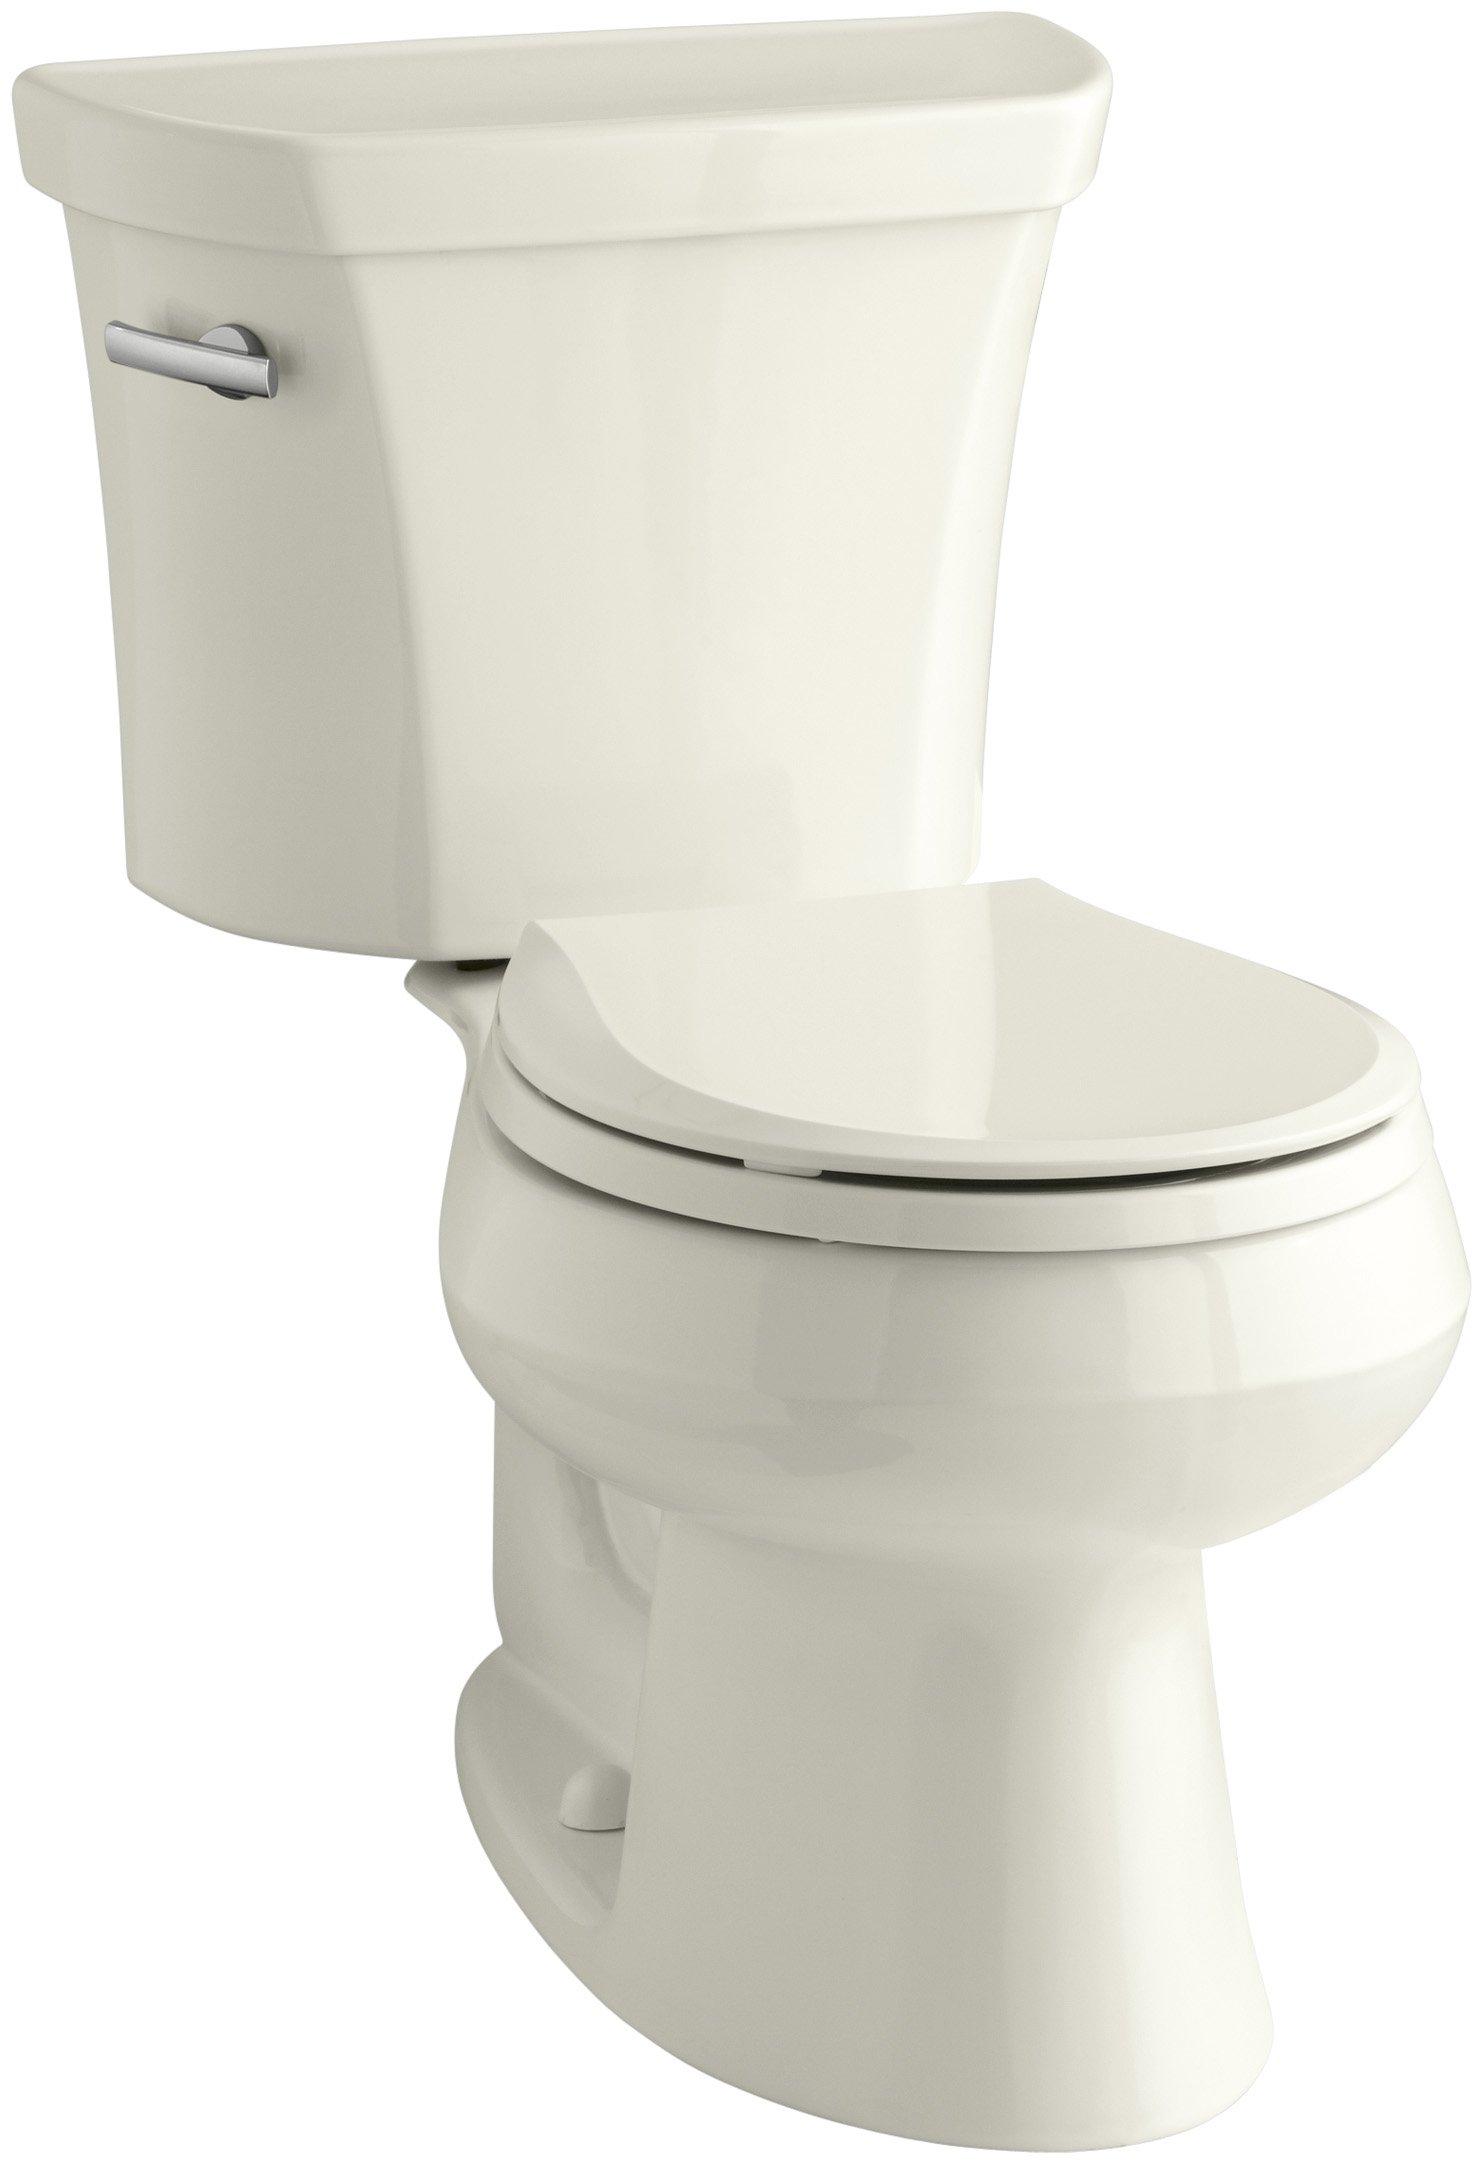 Kohler K-3997-96 Wellworth Round-Front 1.28 gpf Toilet, Biscuit by Kohler